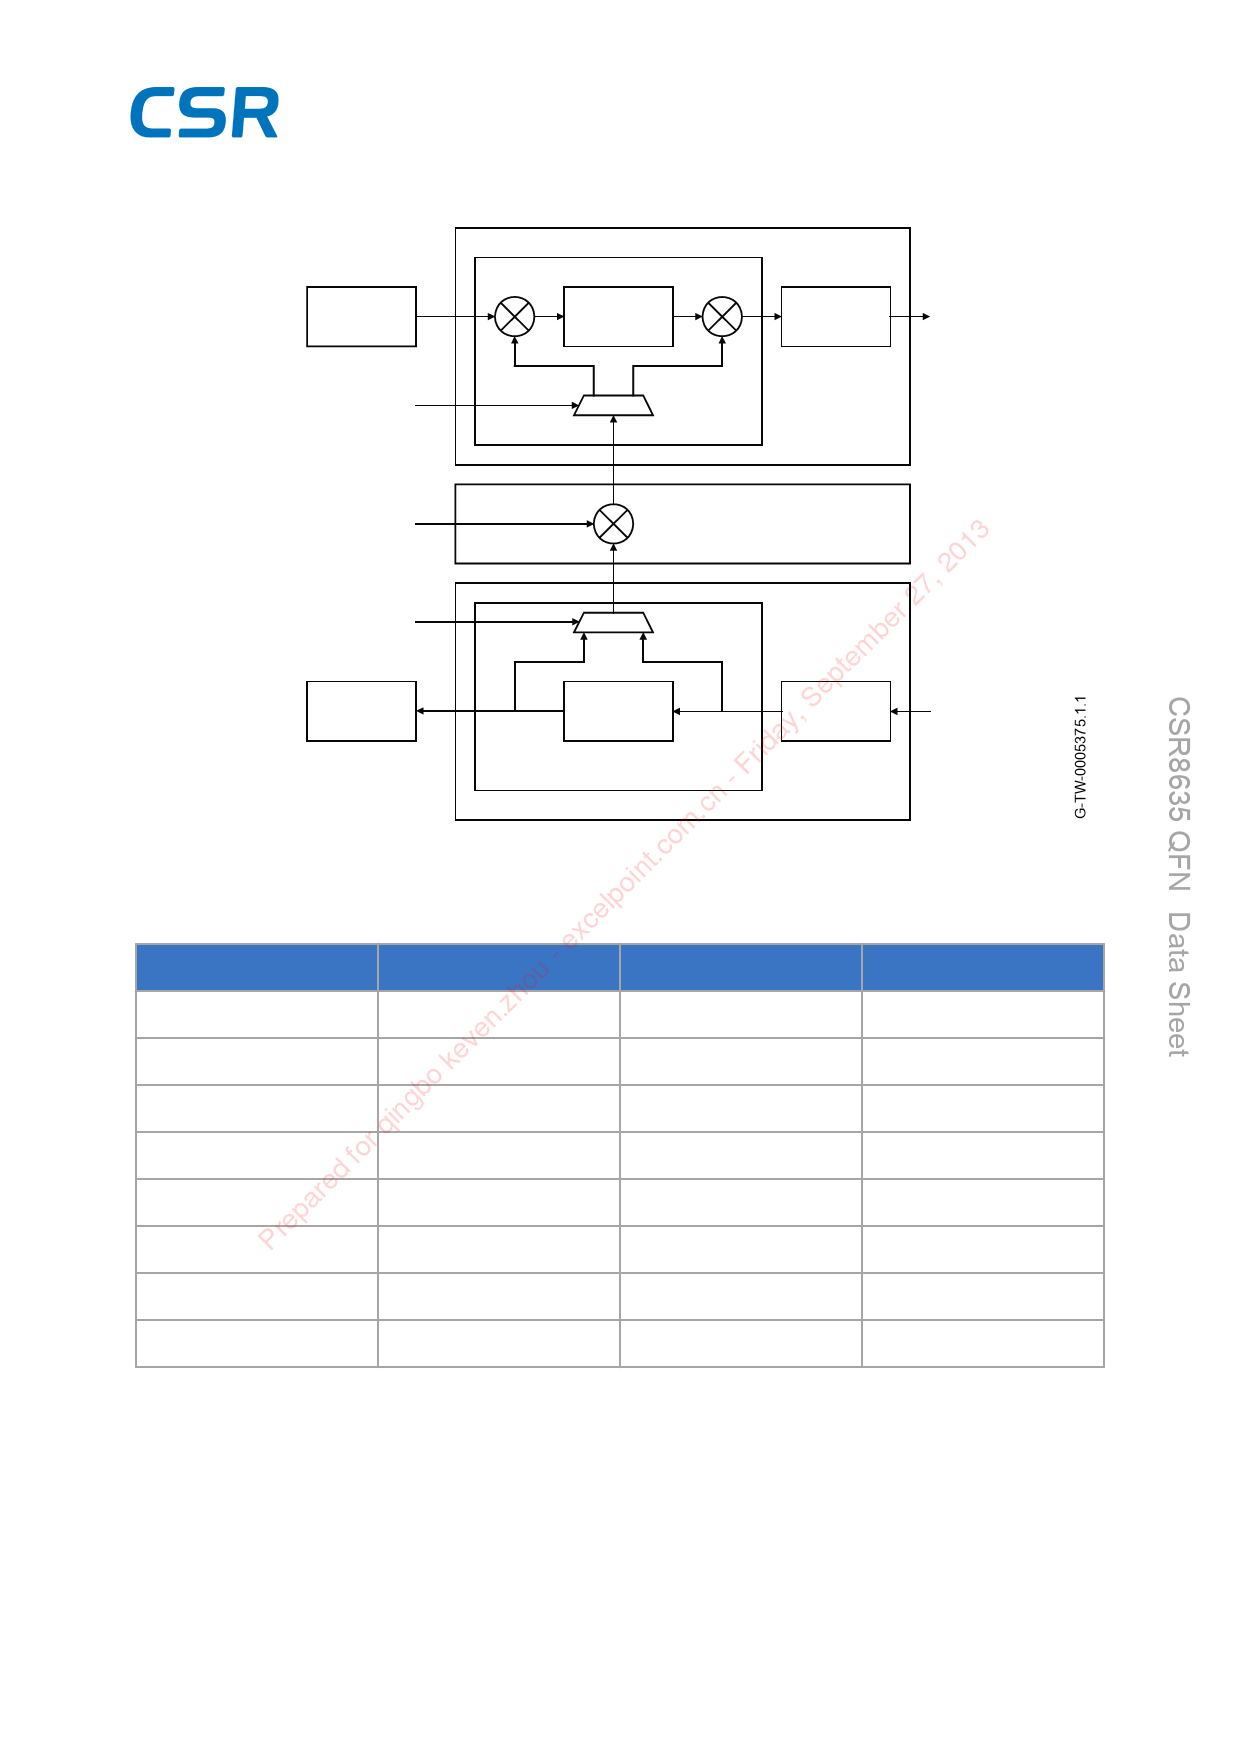 CSR8635 Datasheet PDF - CSR plc